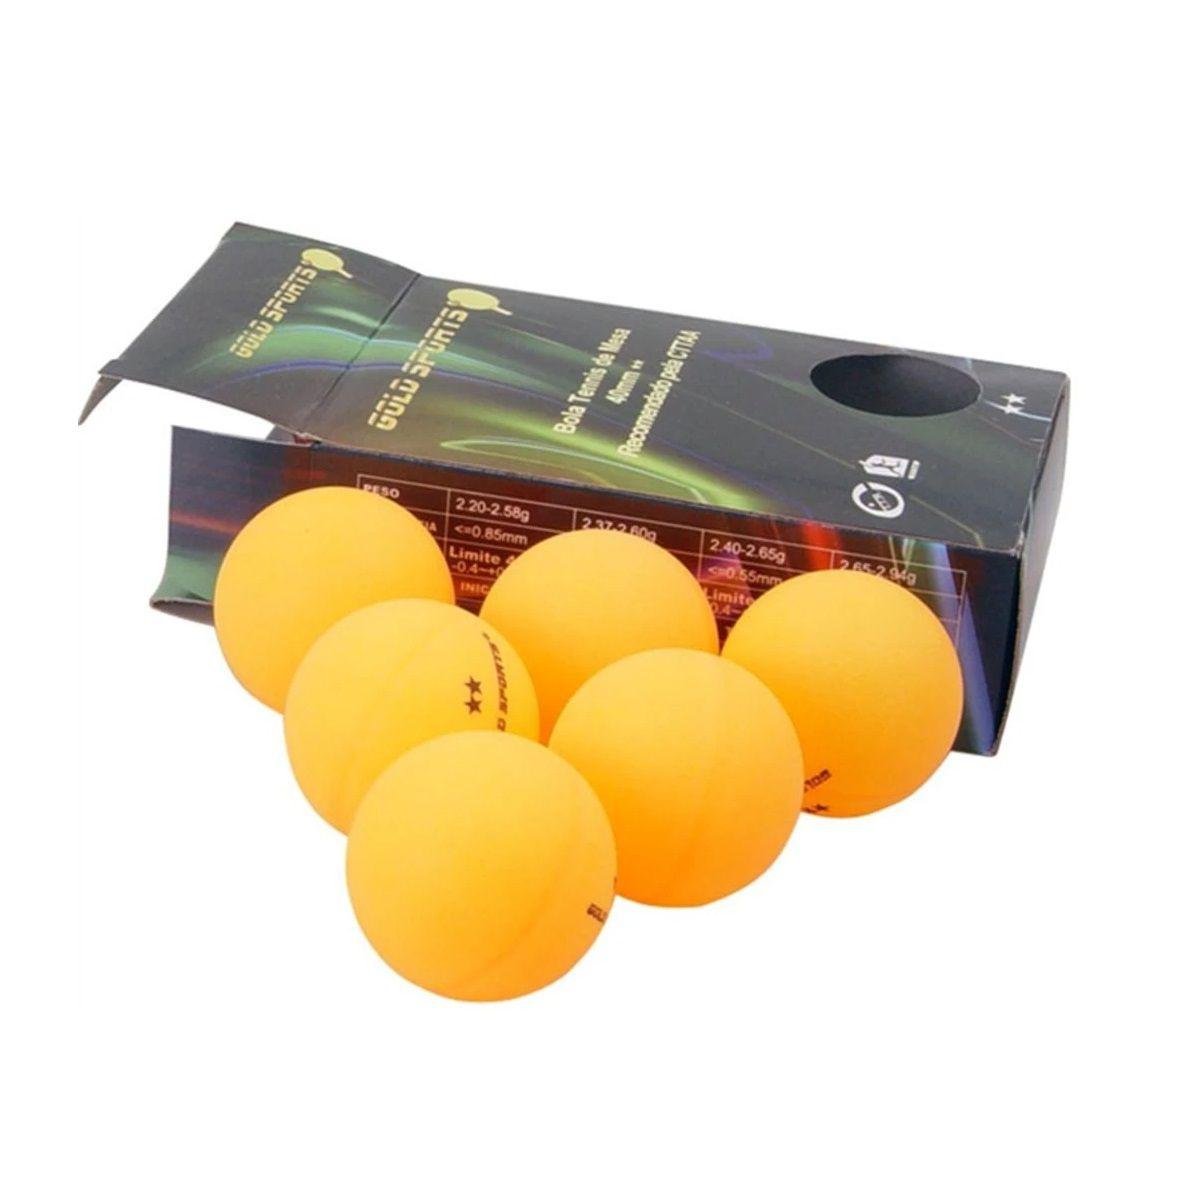 Kit 6 Bolas Para Tênis de Mesa 2 Star - Gold Sports